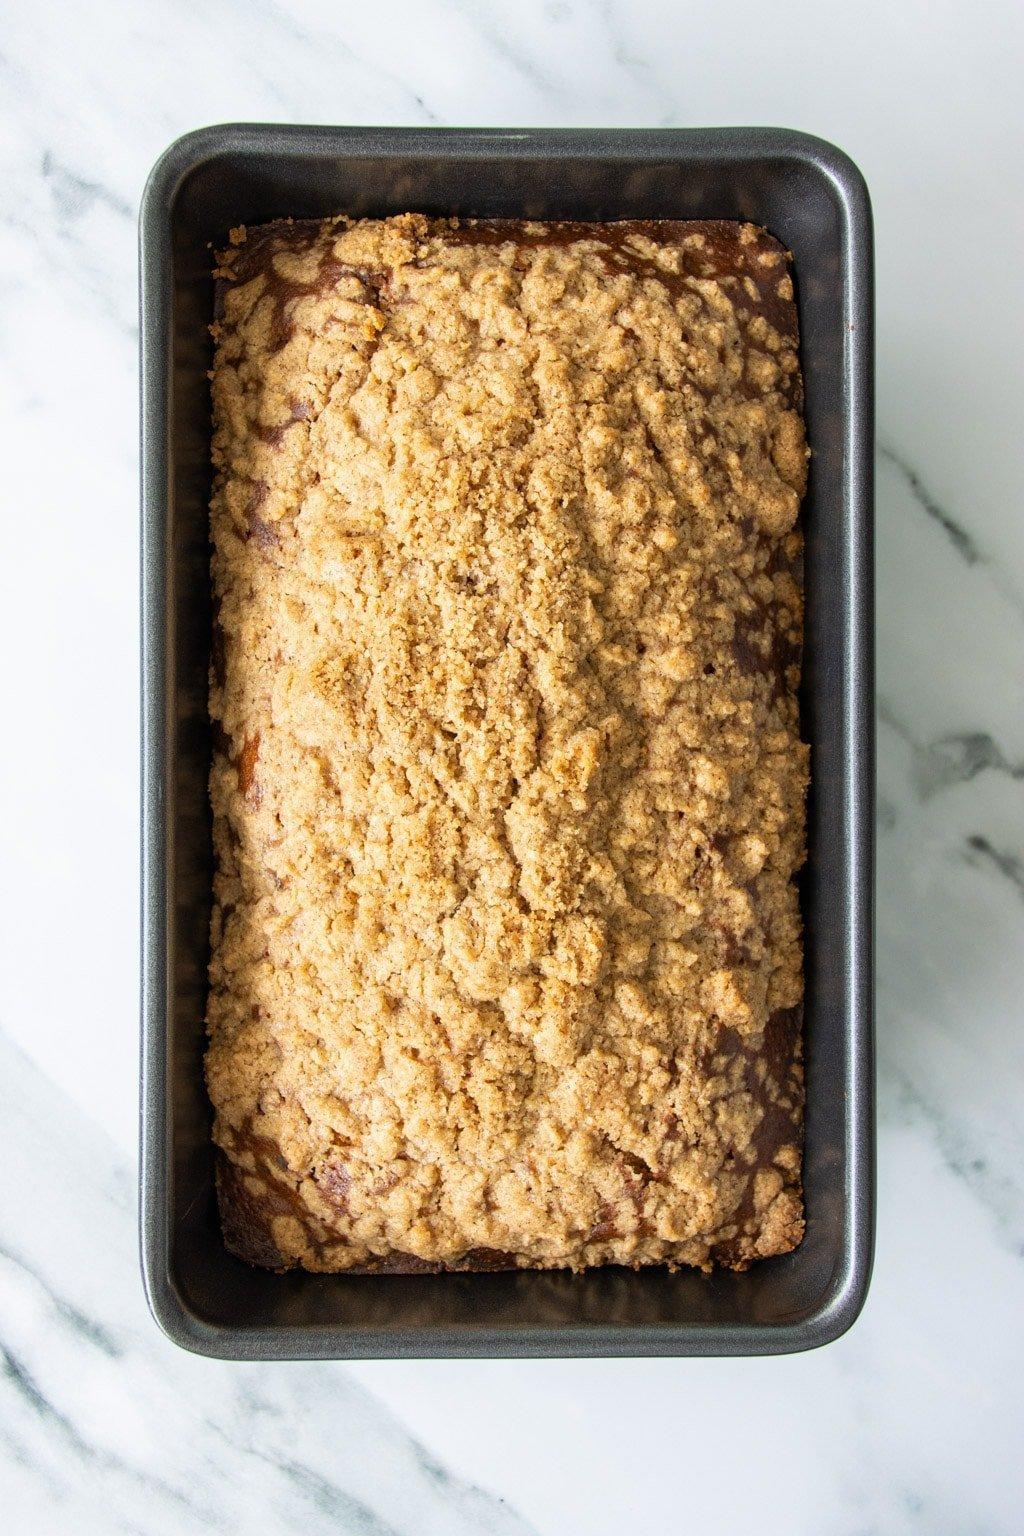 Cranberry pecan loaf cake